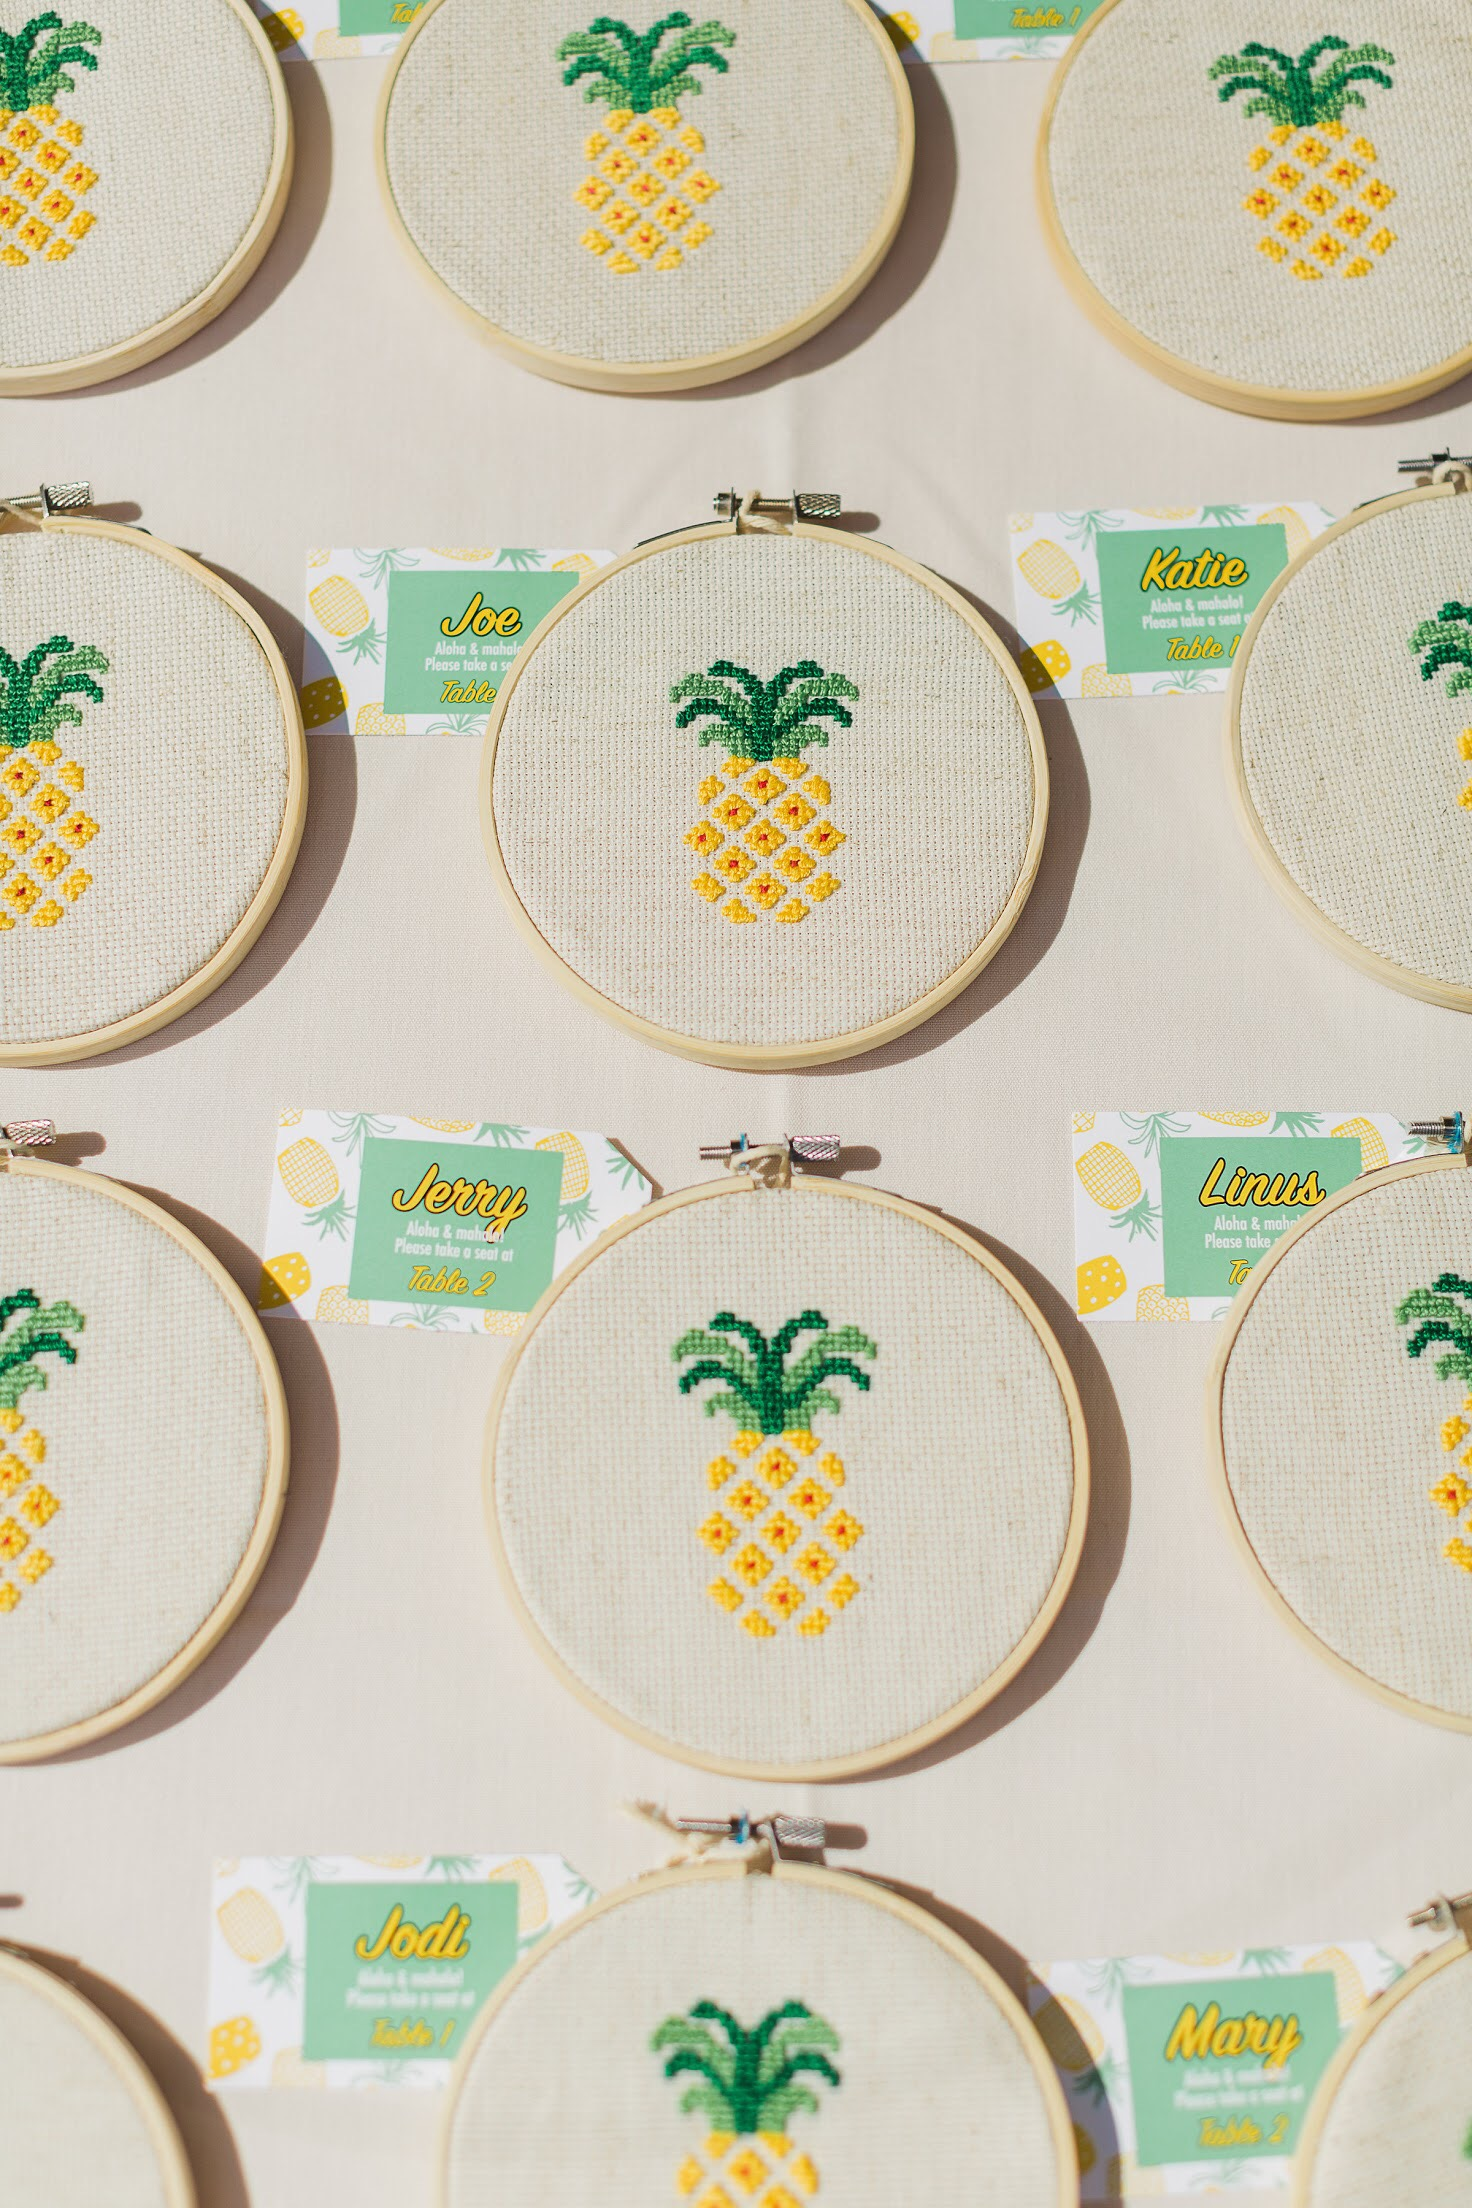 Pineapple cross stitches